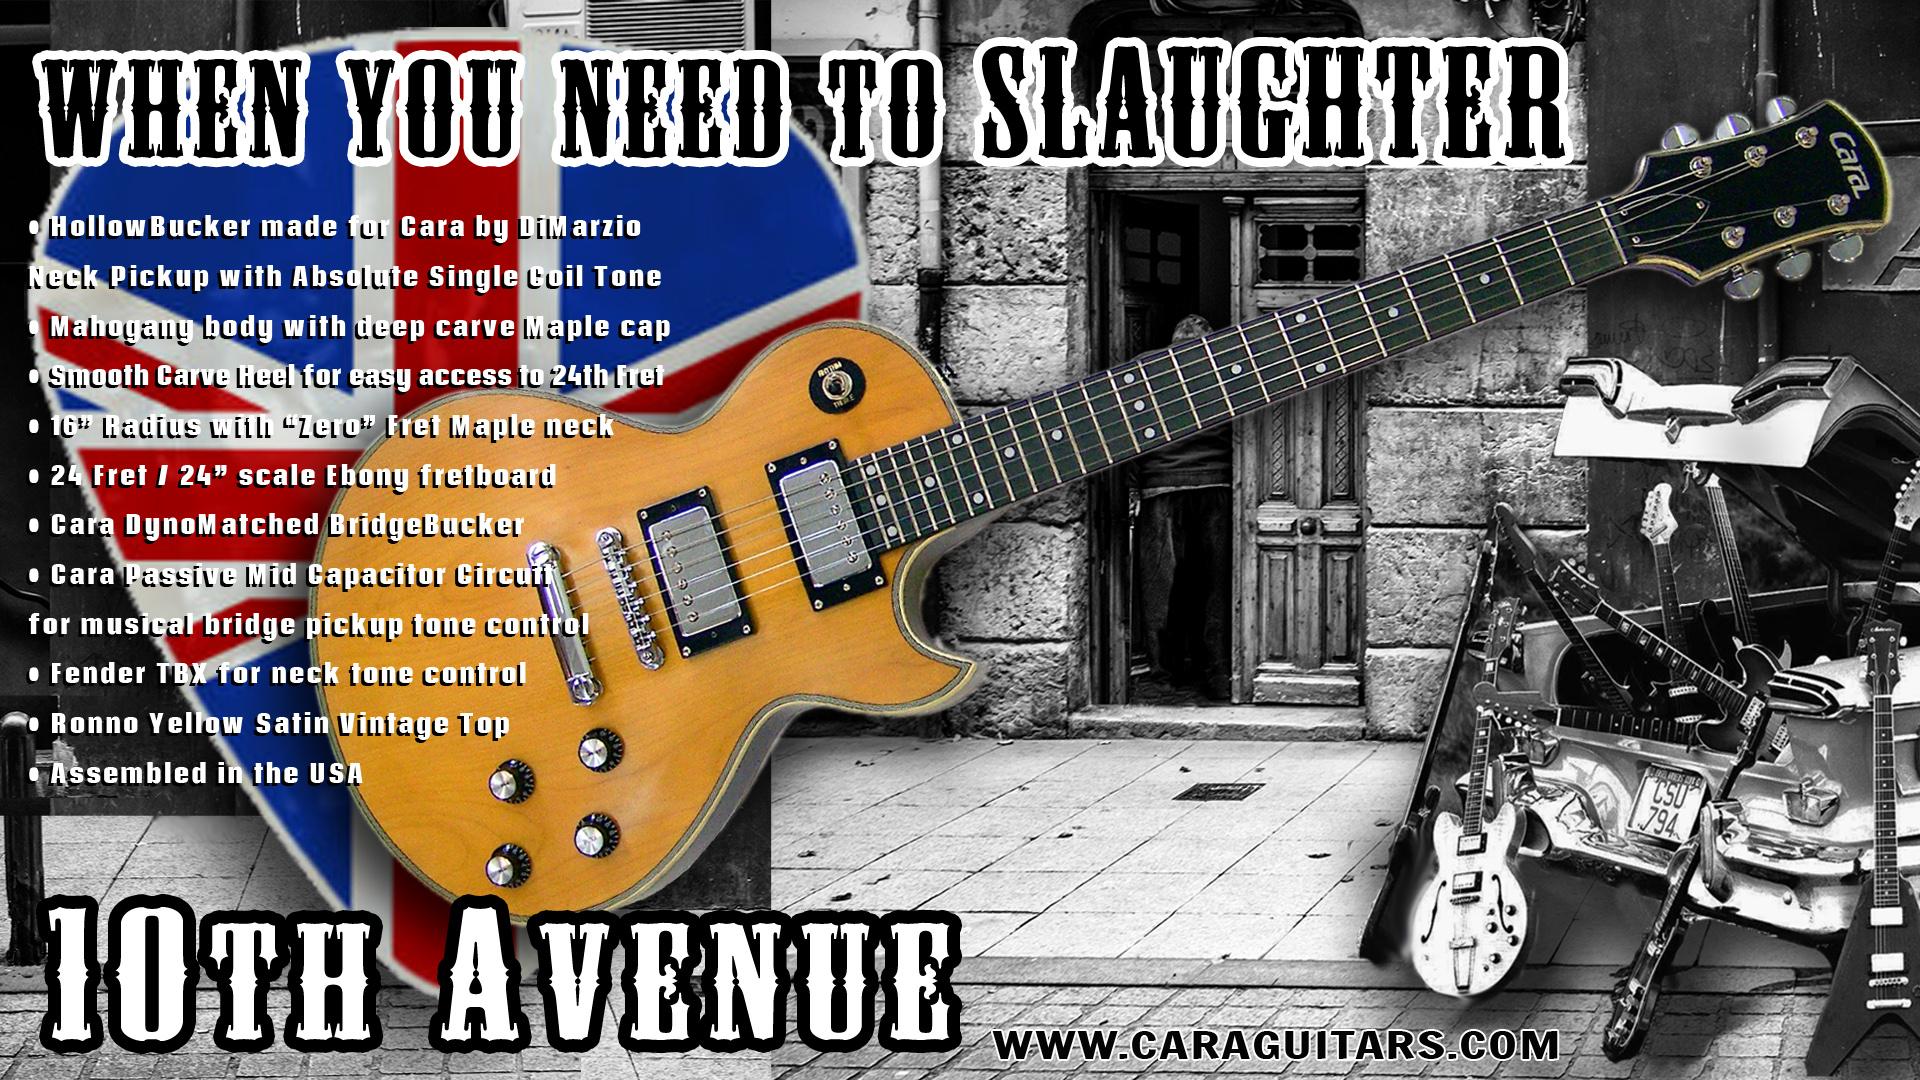 Cara Guitars 10th Avenue Deluxe Single Cutaway in Mick Ronson Ronno Yellow